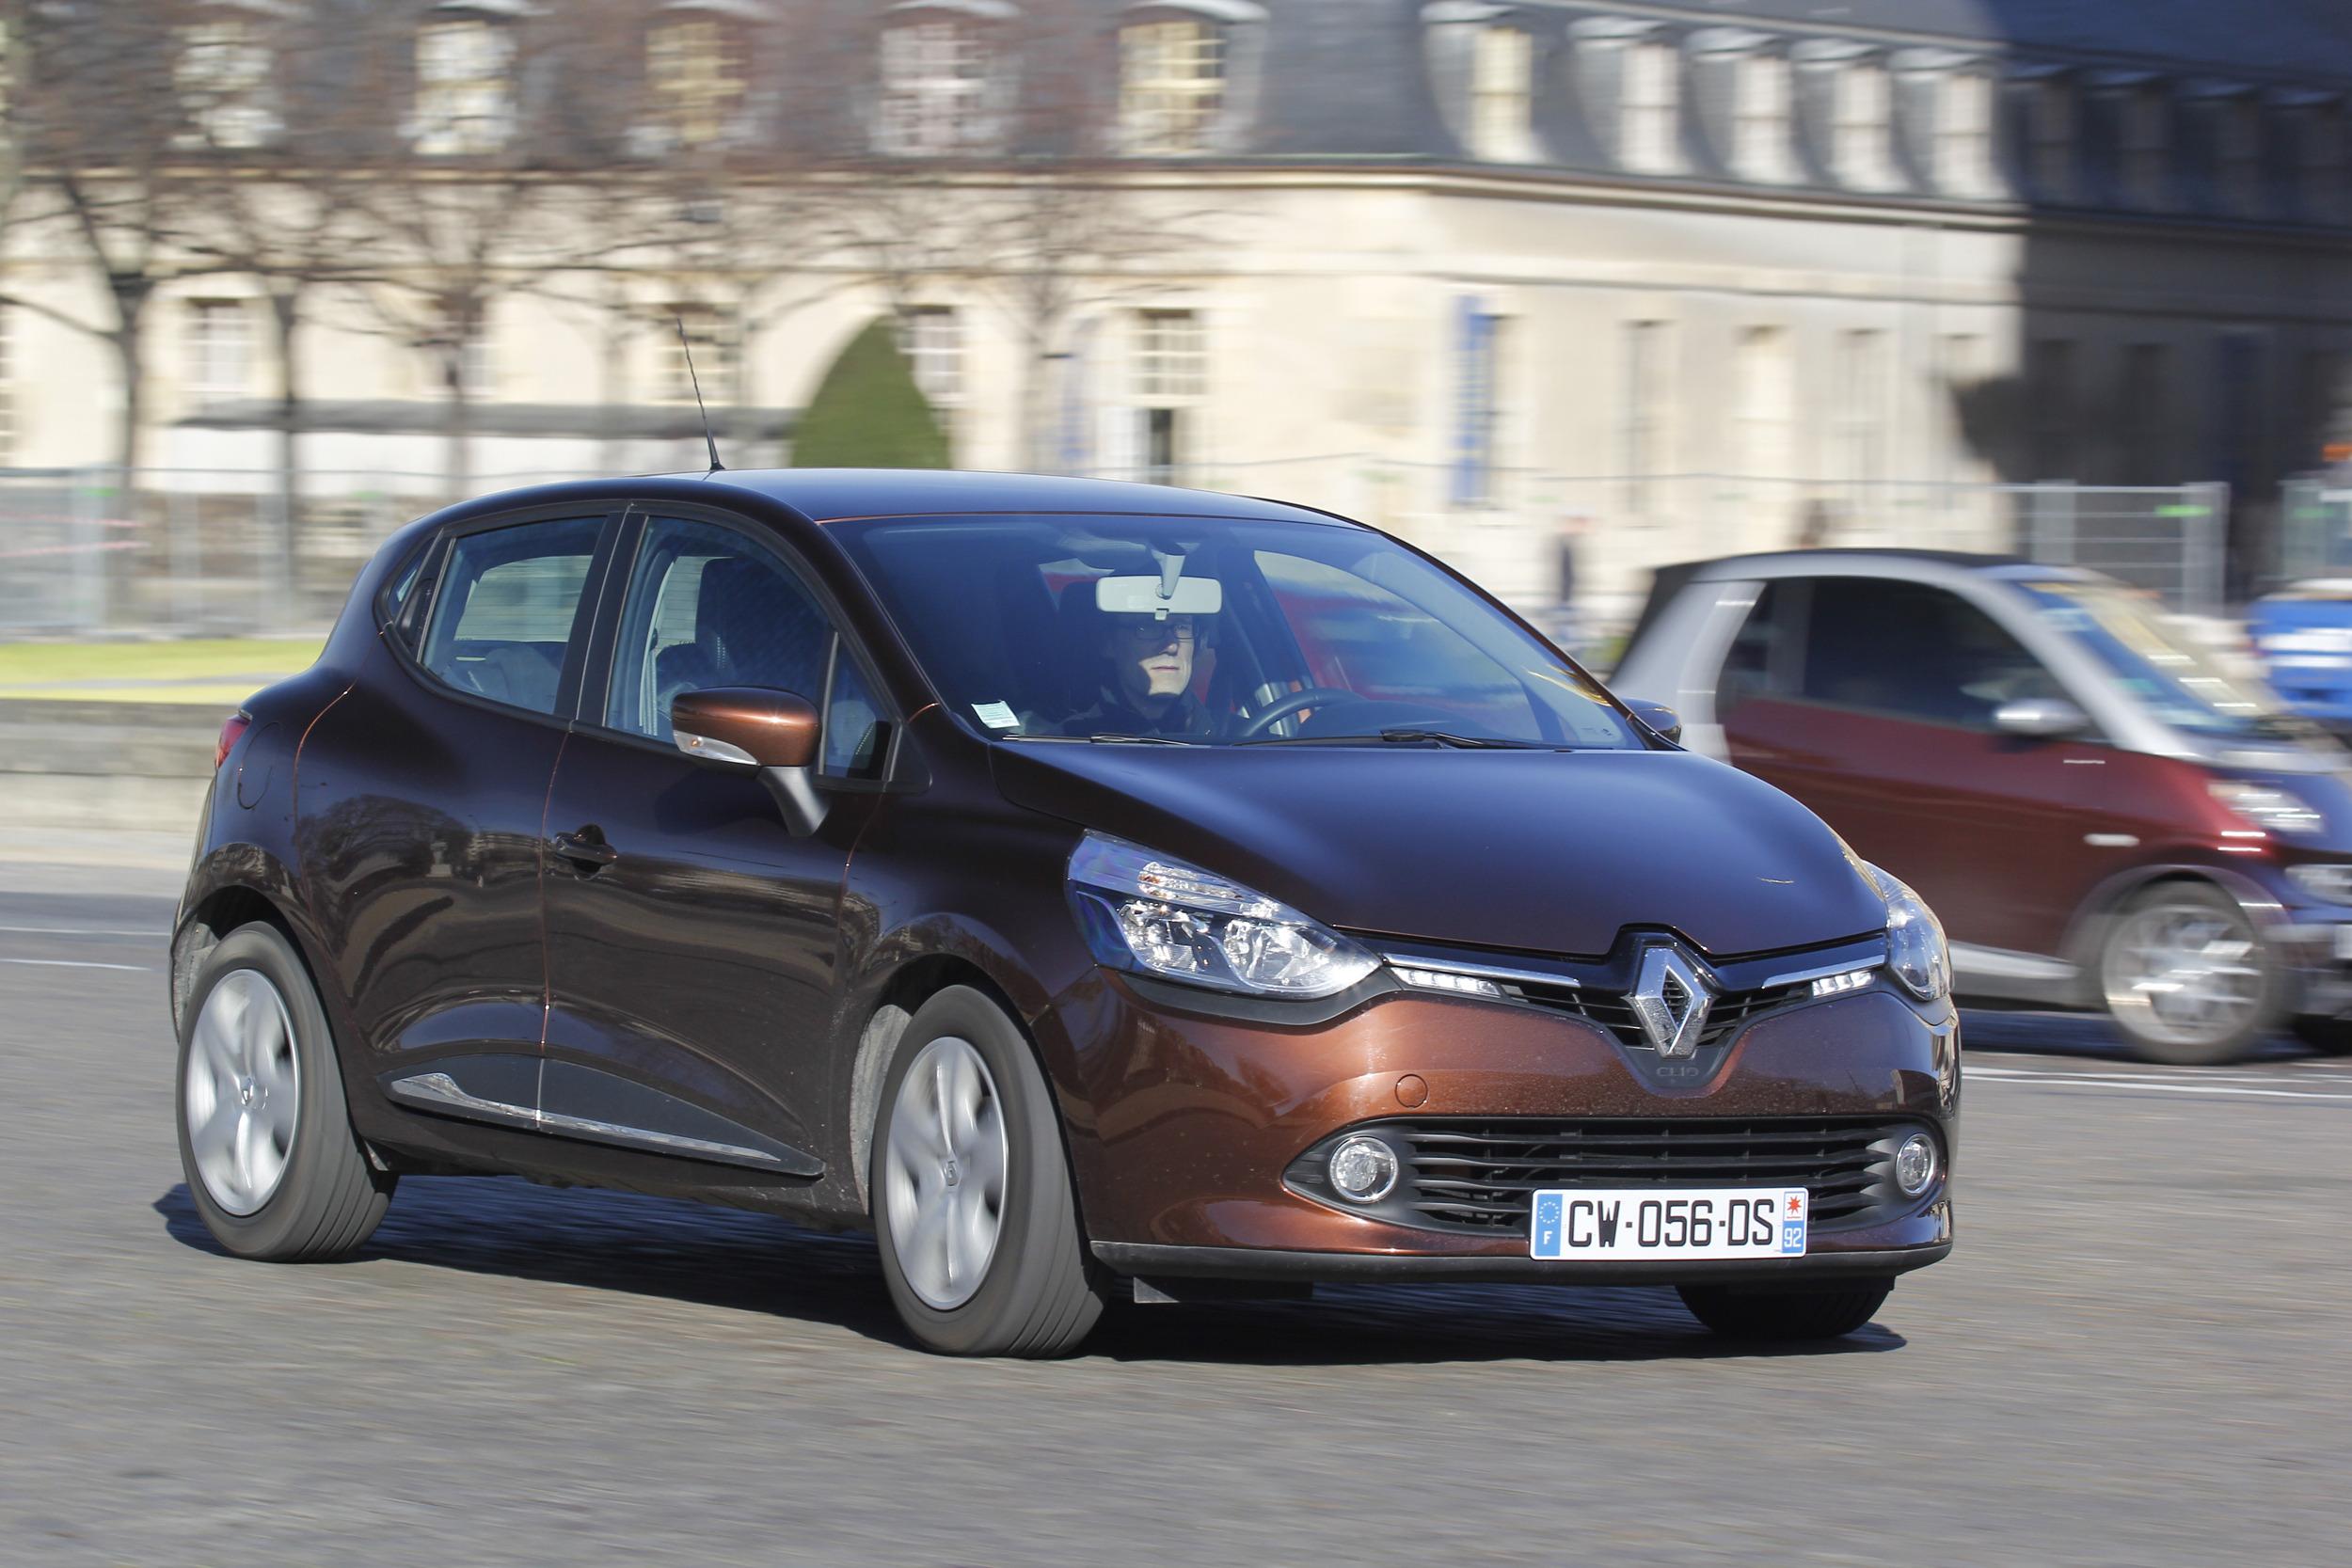 Essai Renault Clio Dci 75 Ch Serait Elle Sa Plus Grande